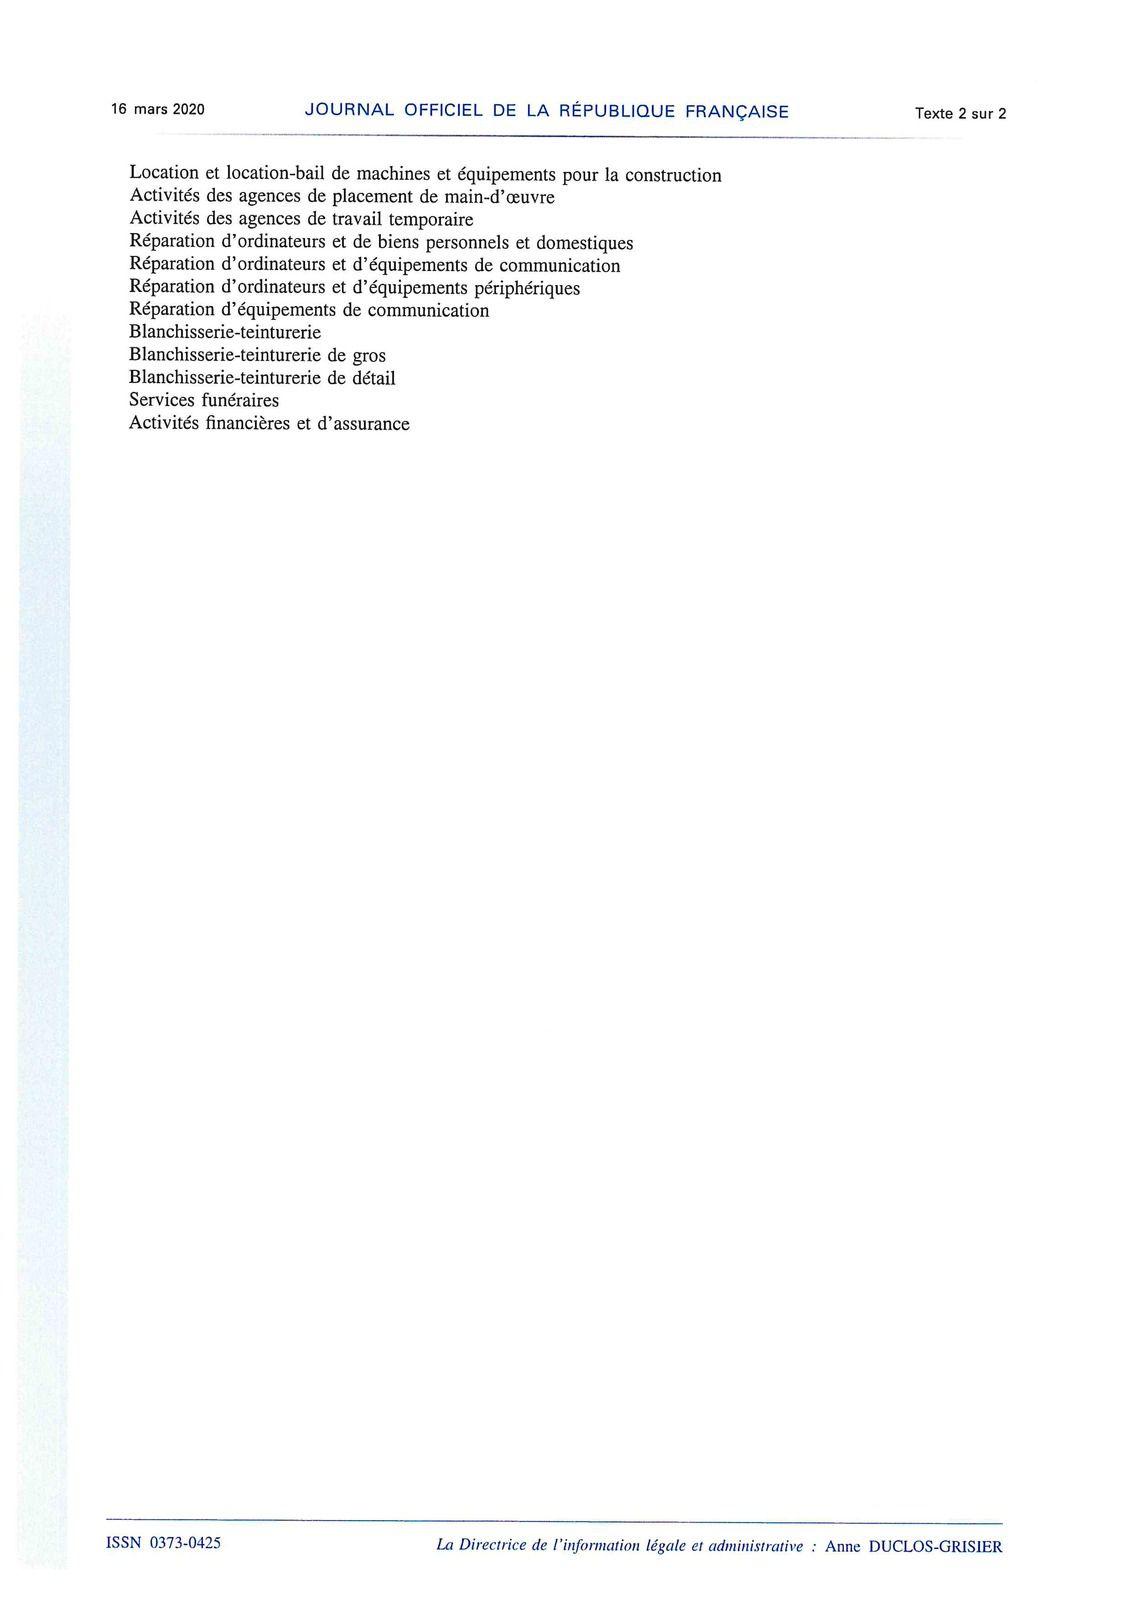 CORONAVIRUS : décret du 15 mars 2020